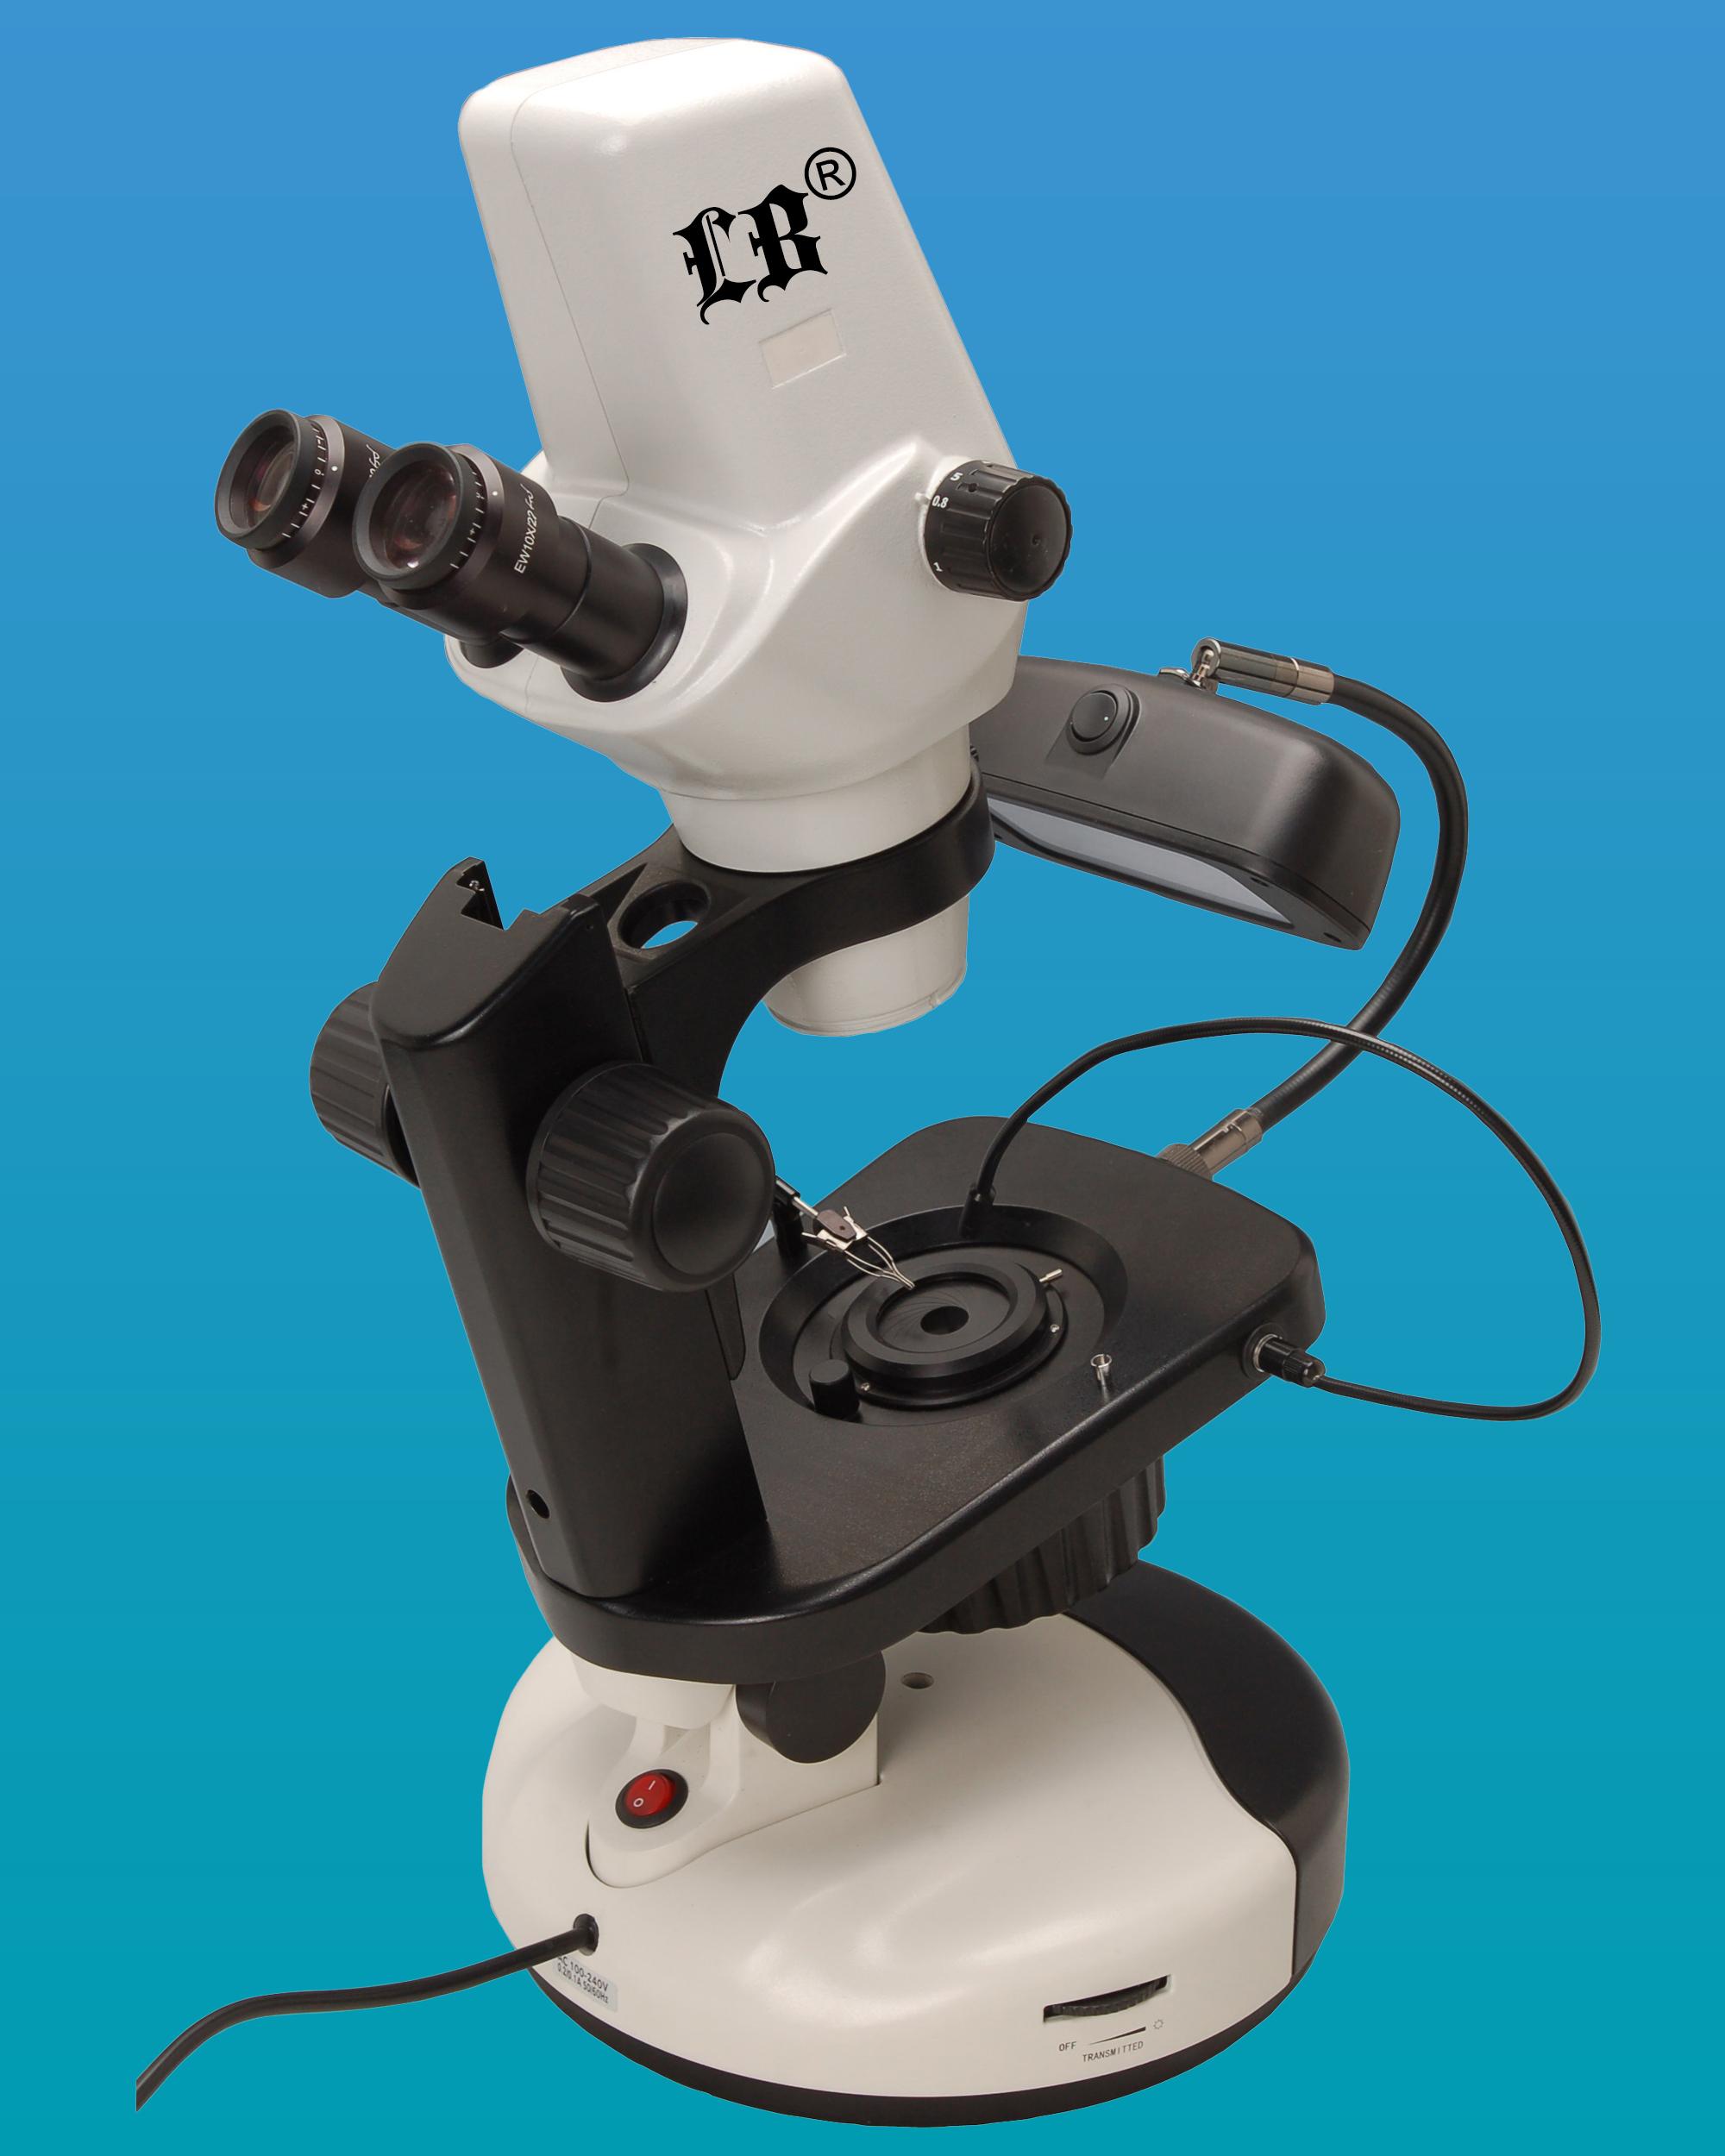 [LB-867] Binocular Digital Stereo Zoom Gemological Microscope w/ Extra Wide Field, 3.2MP Digital Camera, Halogen & Fluorescent Illumination